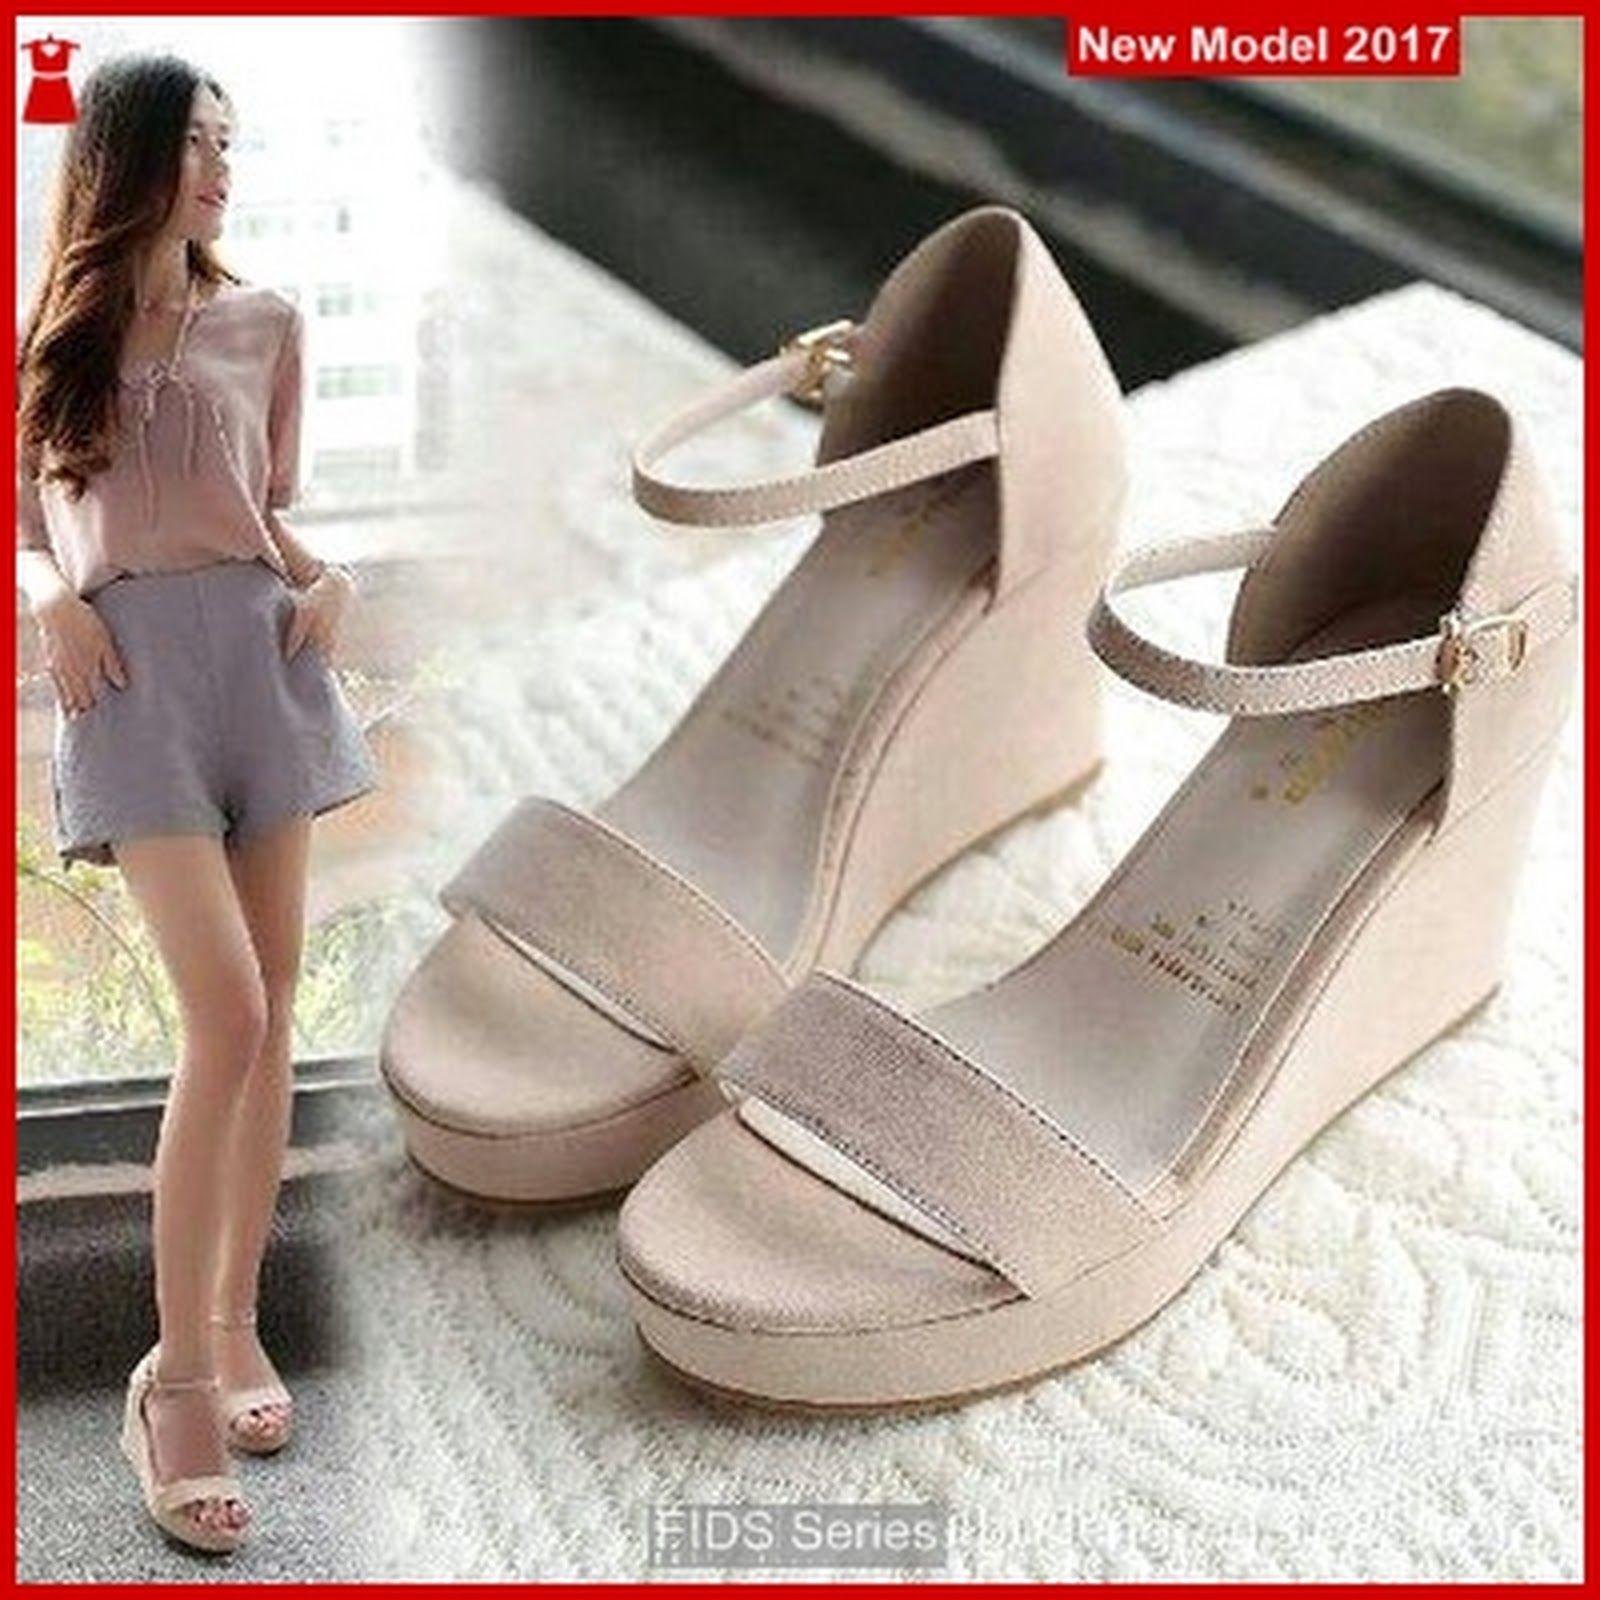 Fids041 Sepatu Wanita Sandal Wedges Donatello Bmgshop Jpg 1600